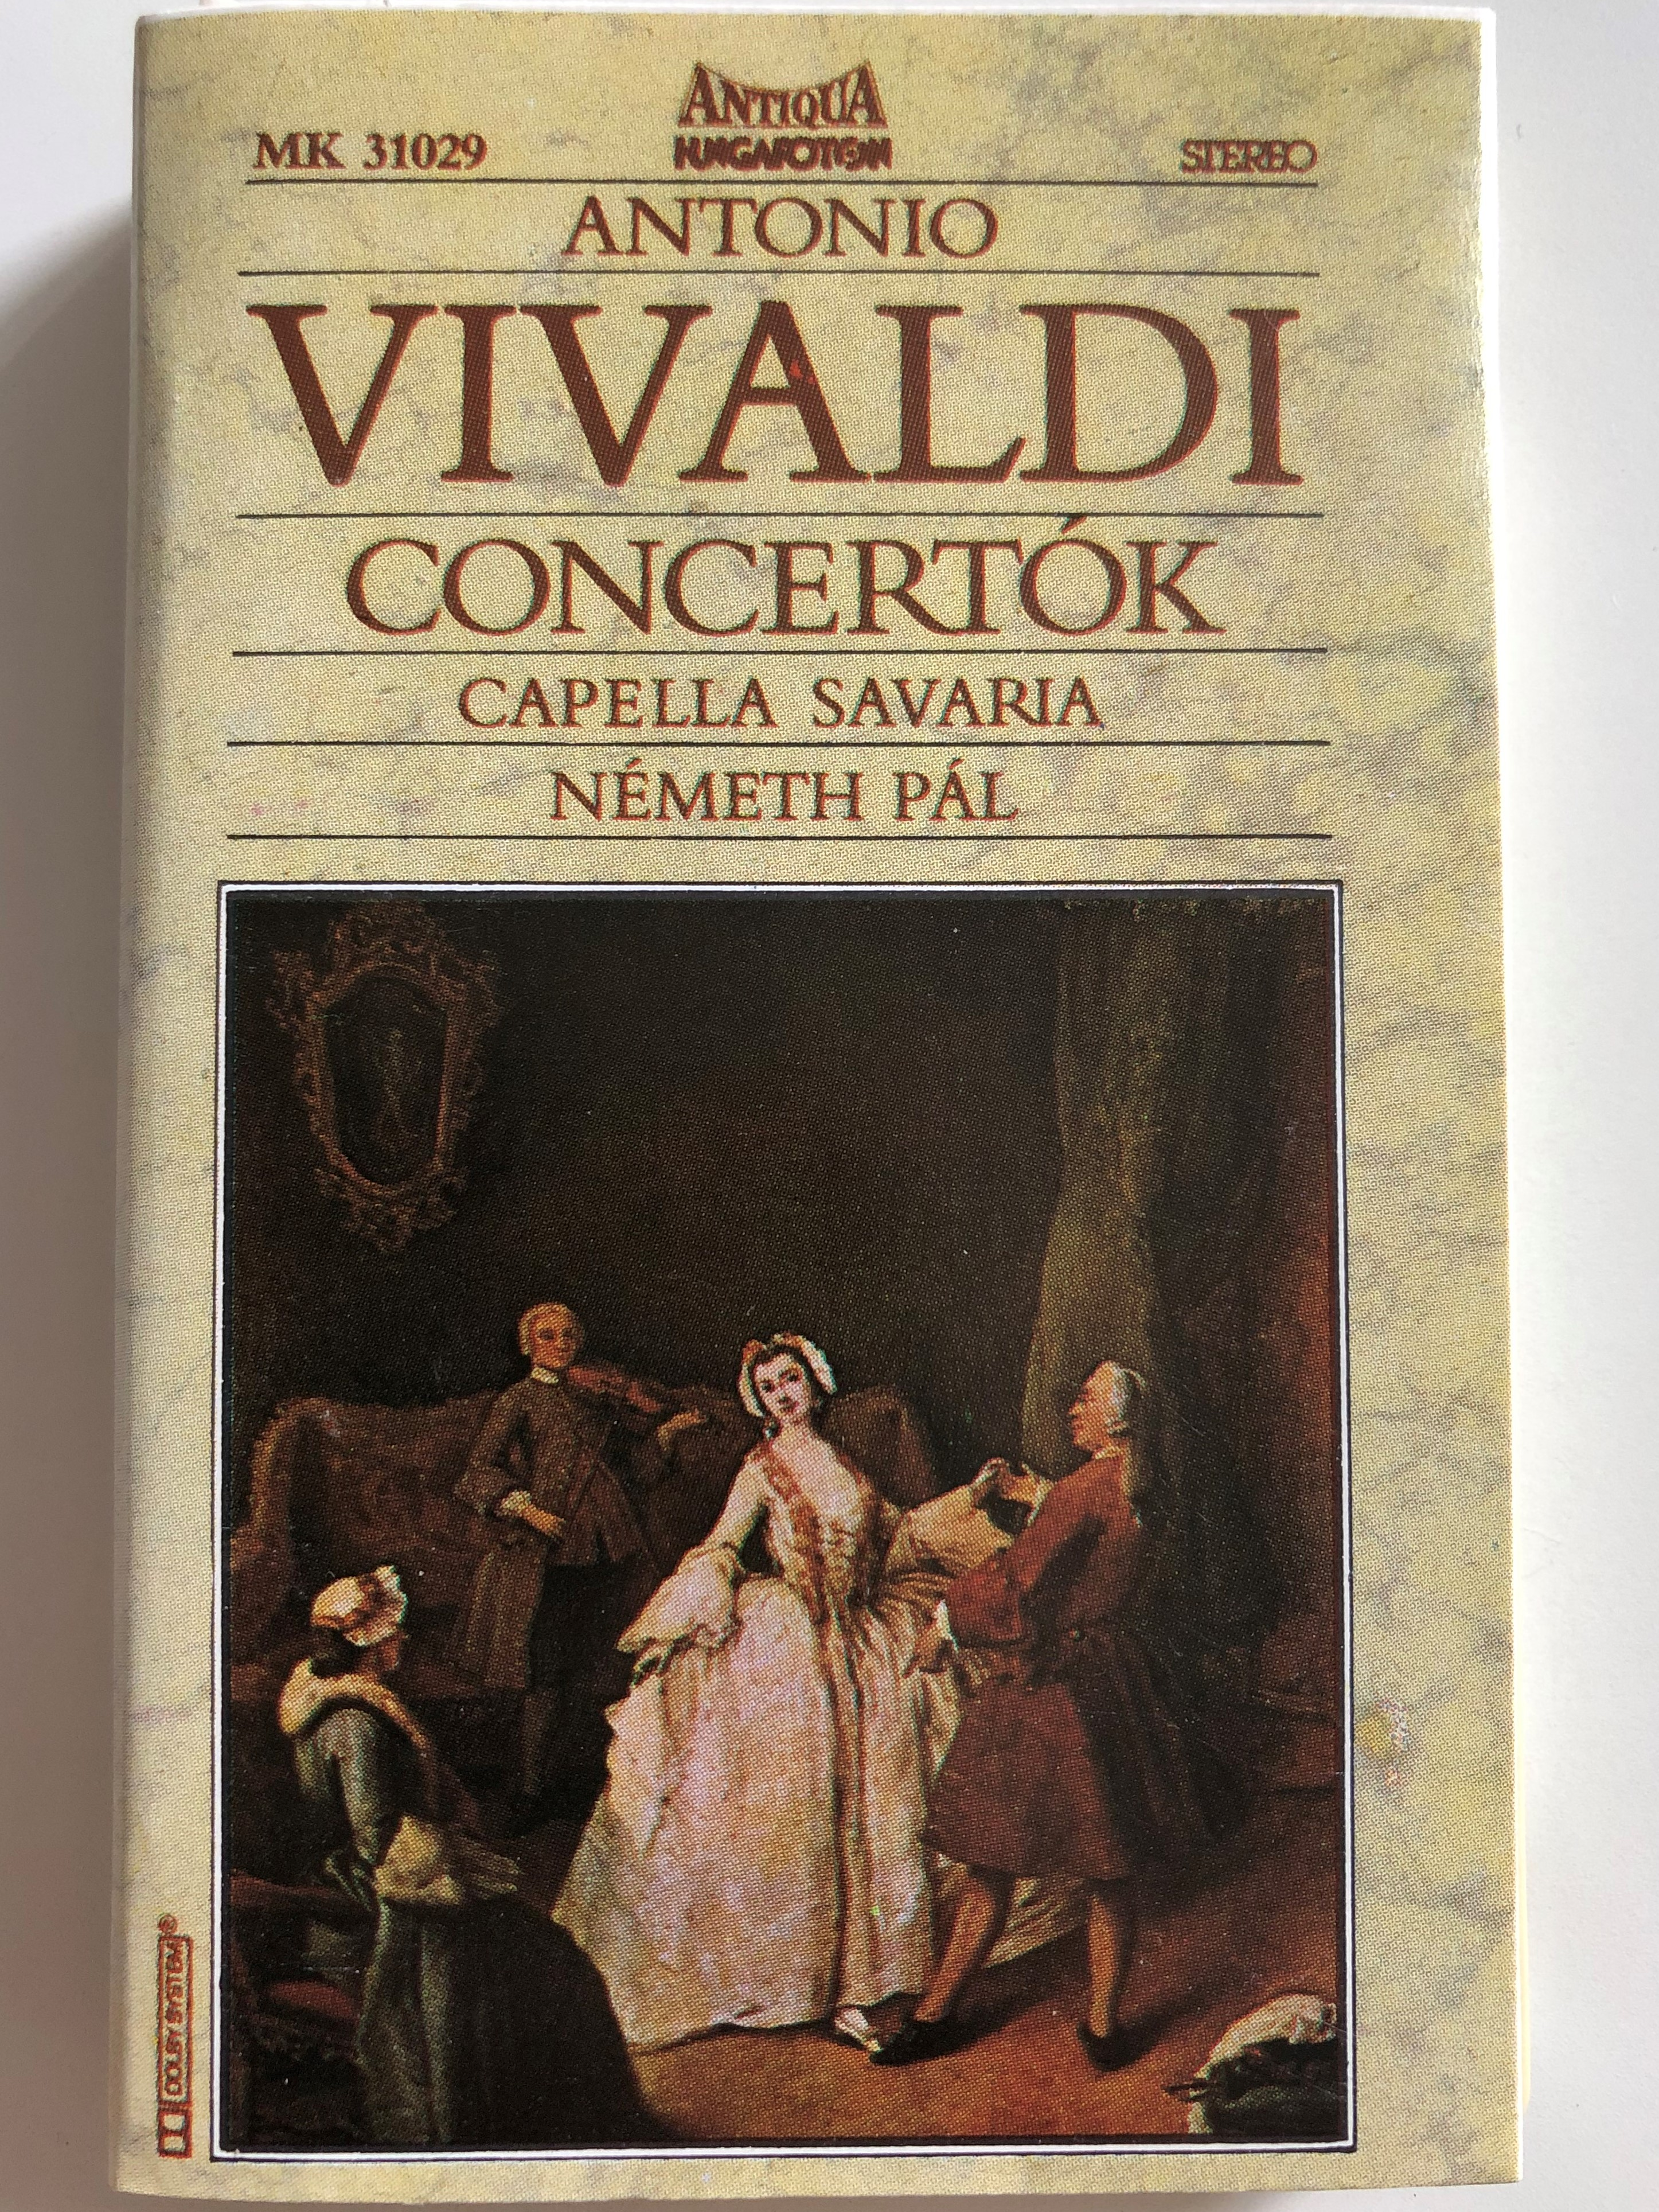 antonio-vivaldi-concert-k-capella-savaria-nemeth-pal-hungaroton-antiqua-cassette-stereo-mk-31029-1-.jpg